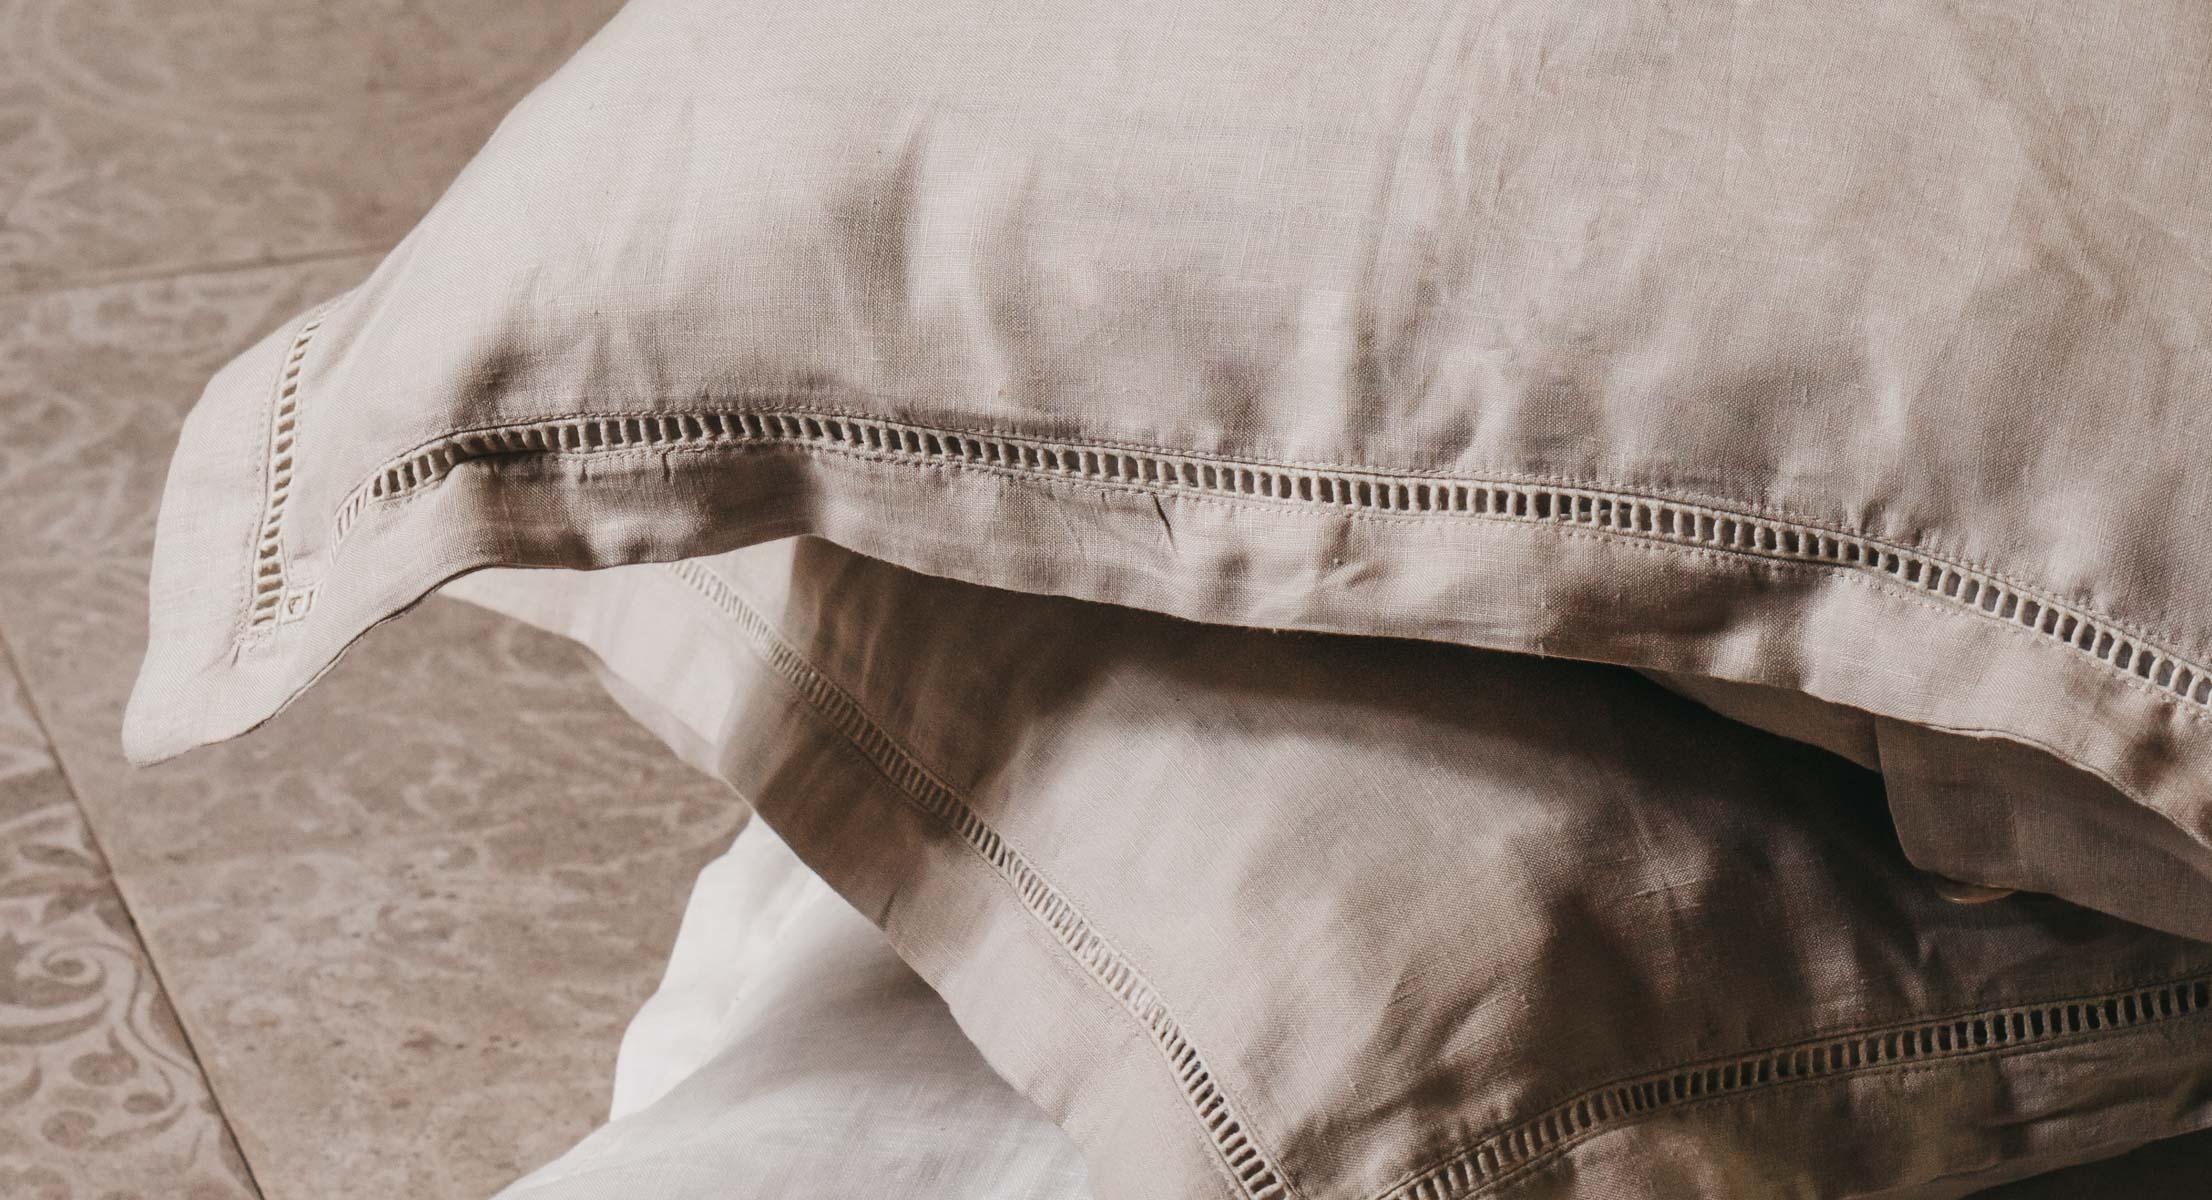 Keira-Mason-in-between-the-sheets-cream-sheets.jpg